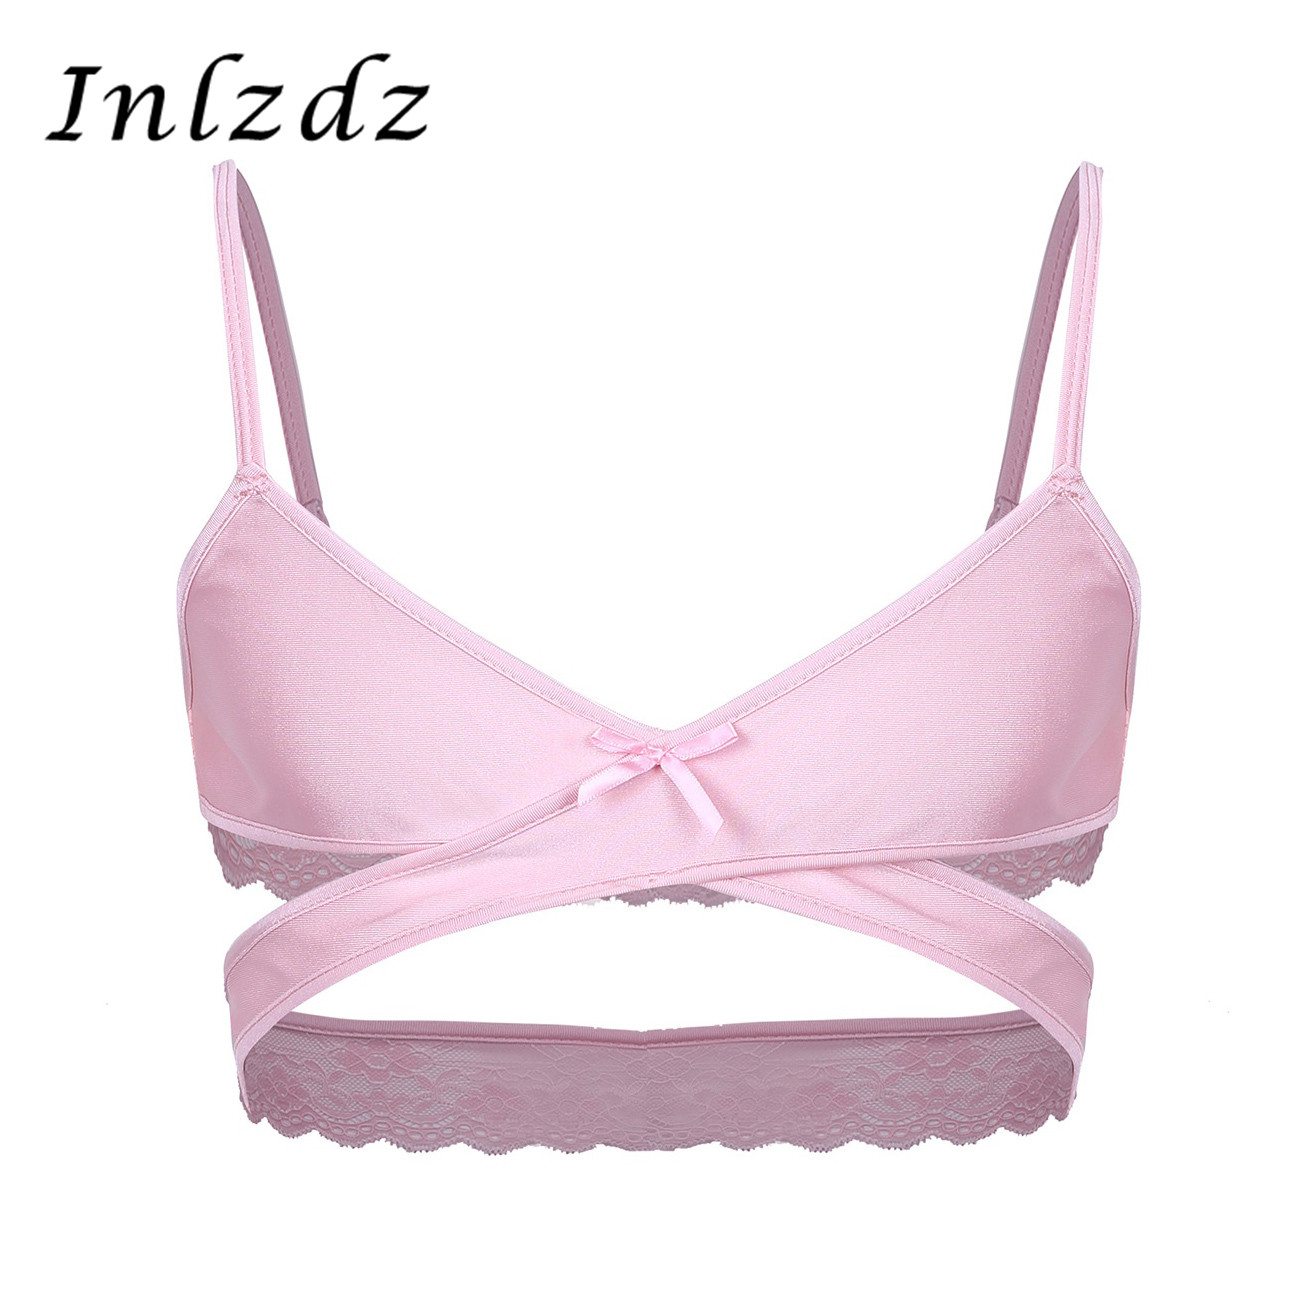 Mens Sissy Crossdresser Bra Open Cup Sex Lingerie Cross Over Back Bra Wire-free No Padded Bra Tops Bralette Exotic Costumes Bra